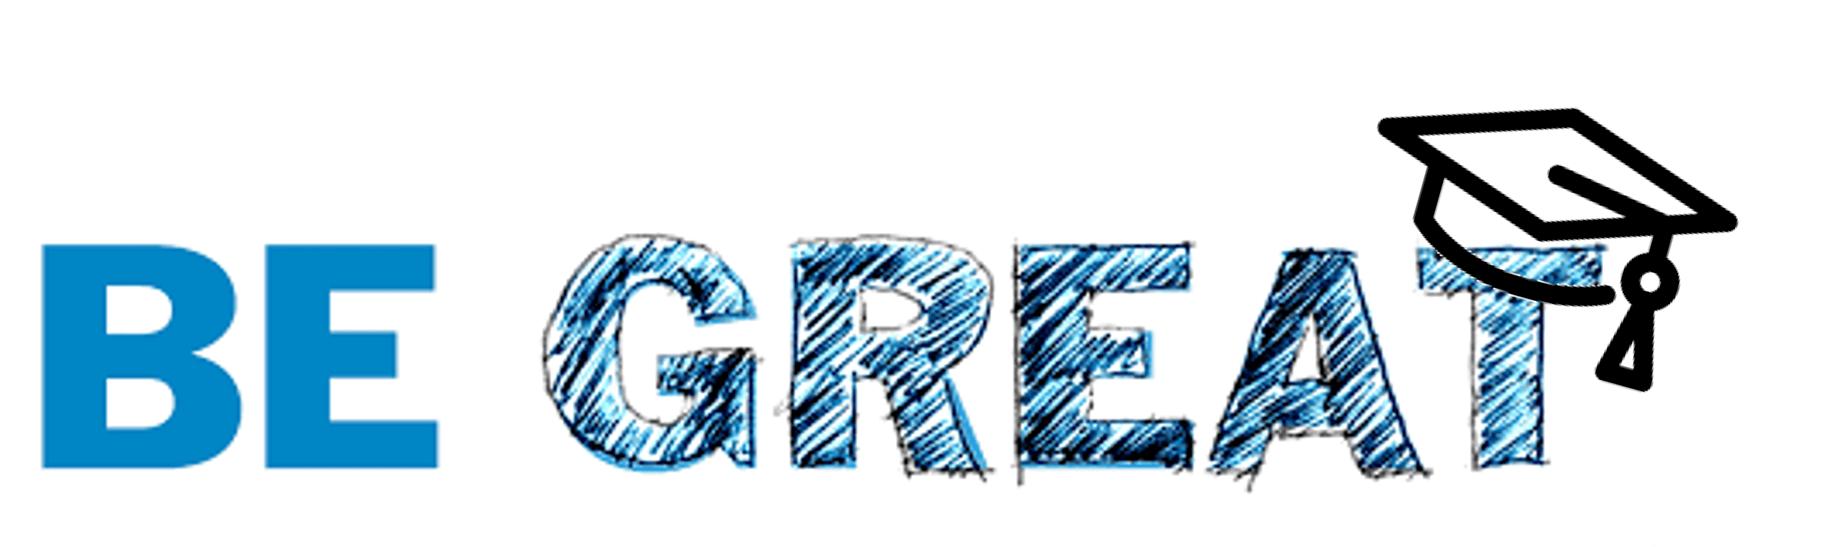 Be-GREAT-graduate-boys-girls-clubs-sheboygan-county